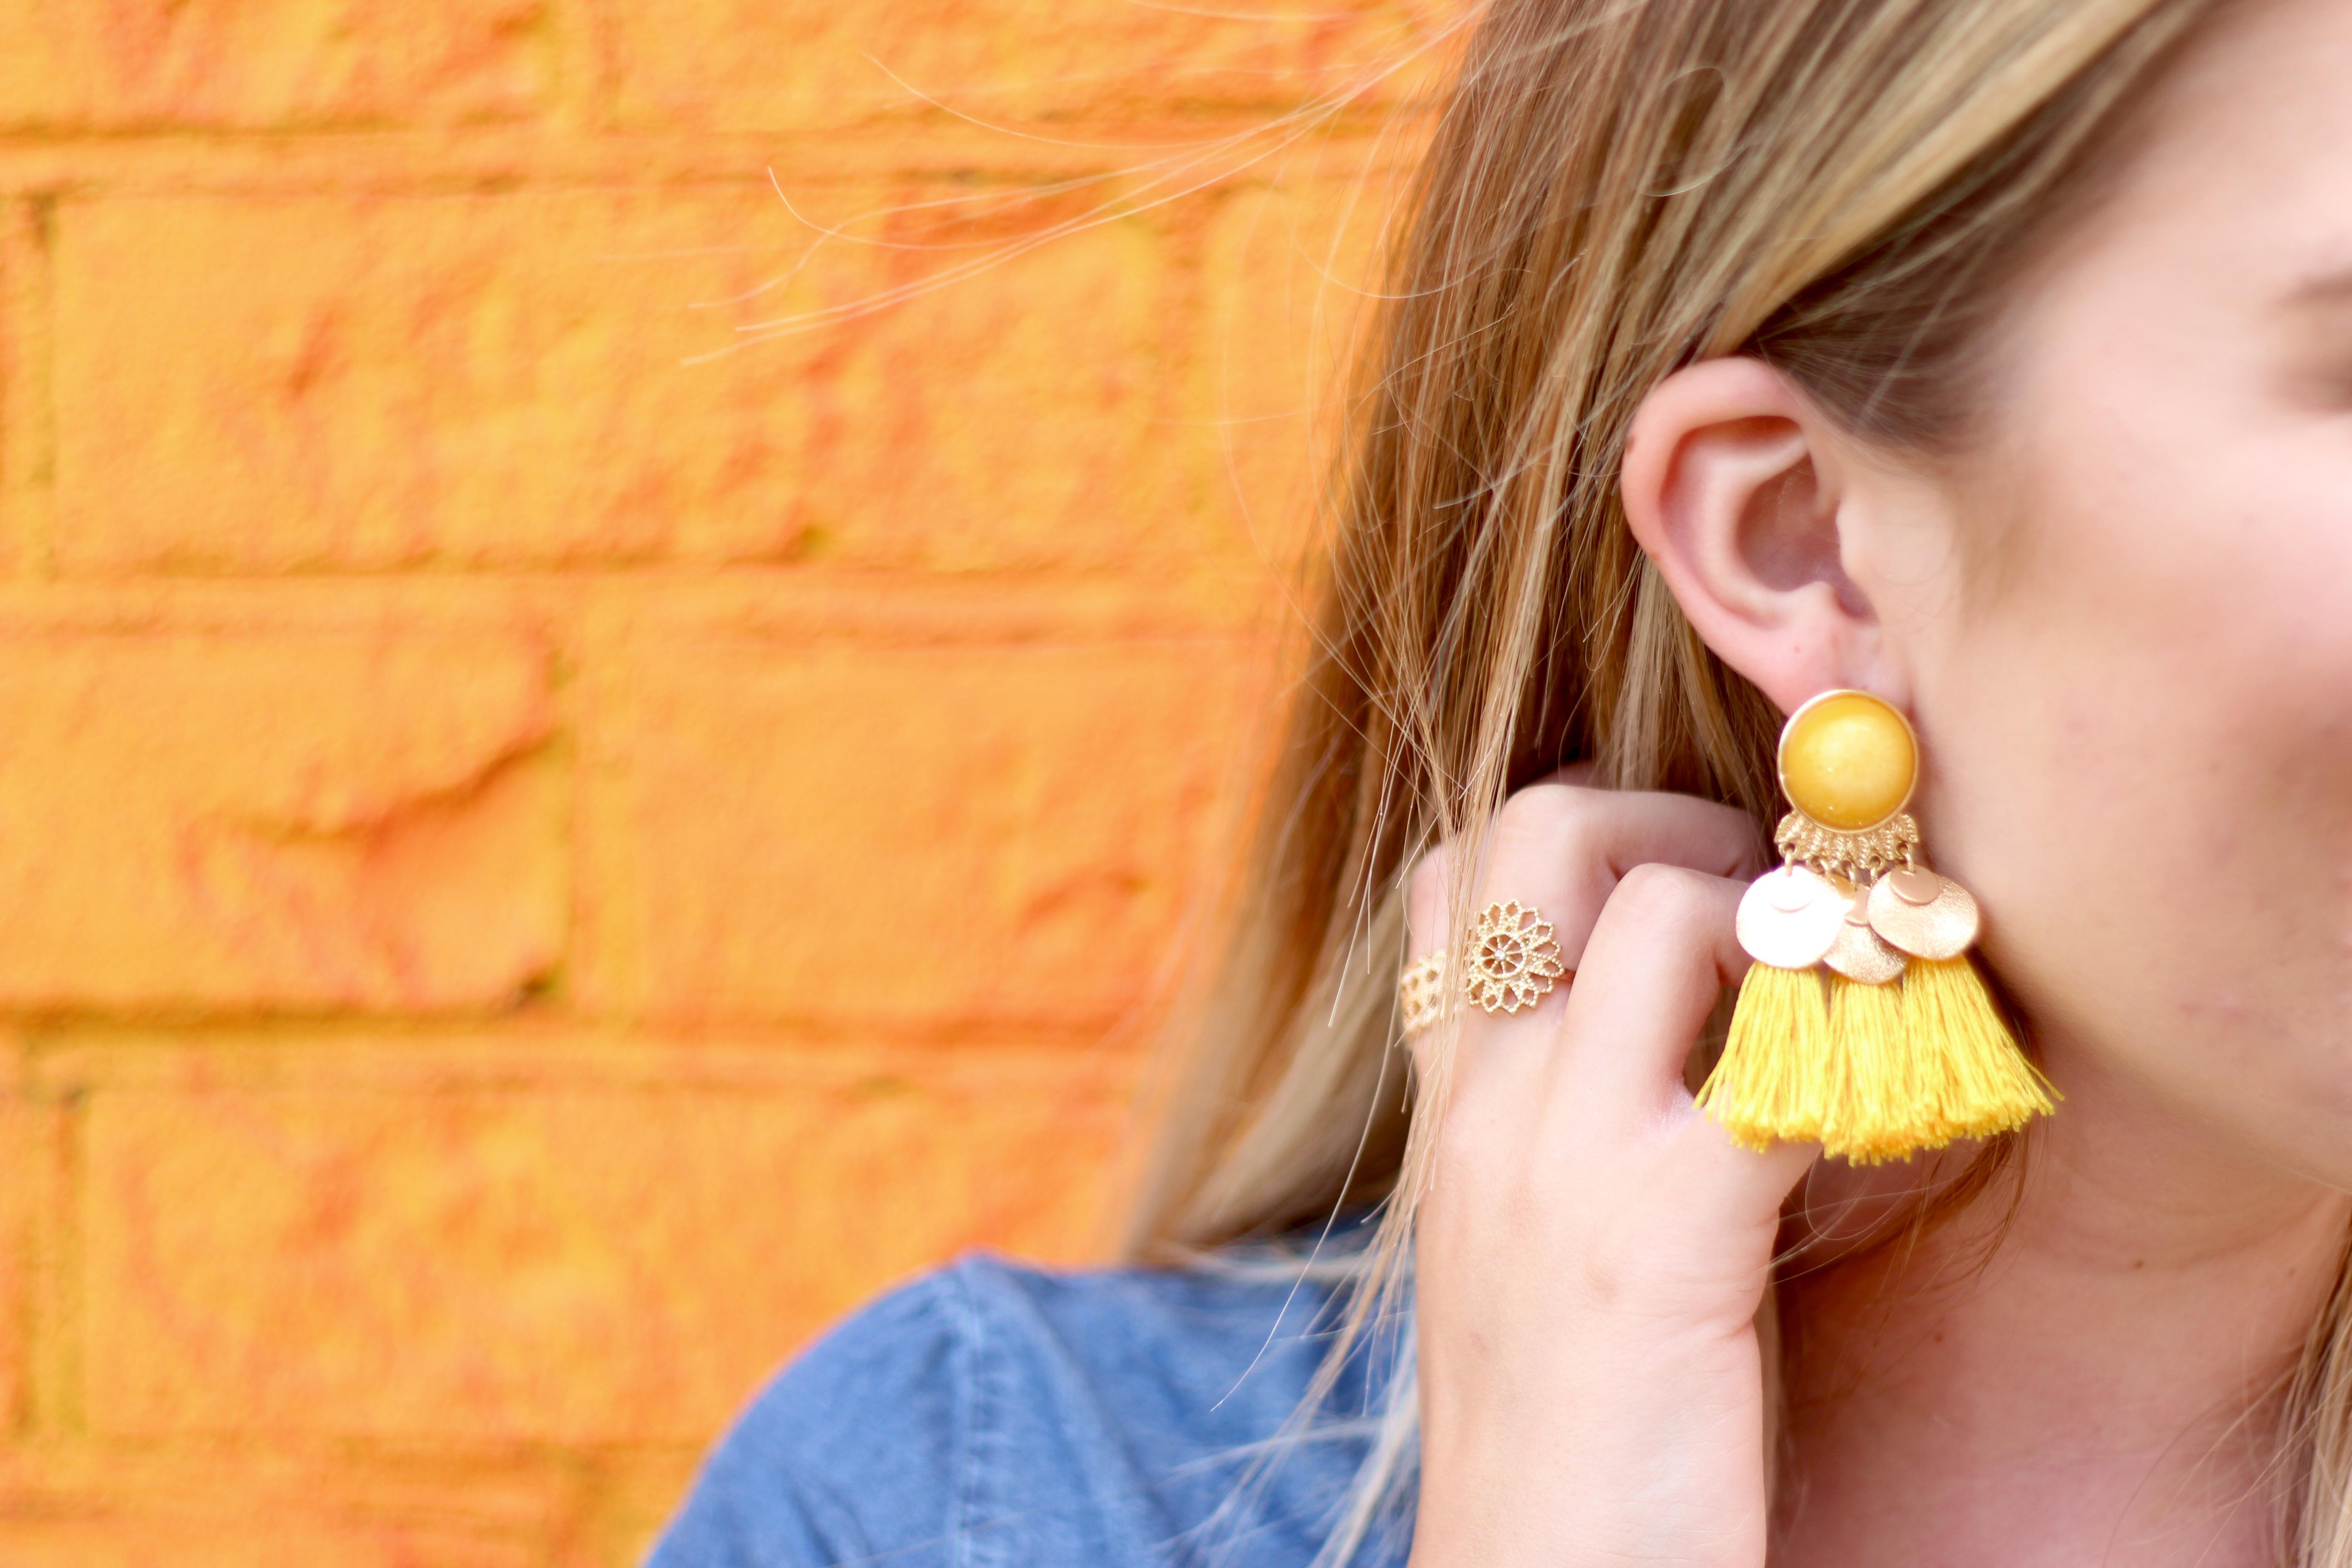 summer tassel earrings | Audrey Madison Stowe Blog - Rainbow Wall in Brooklyn by popular Texas travel blogger Audrey Madison Stowe